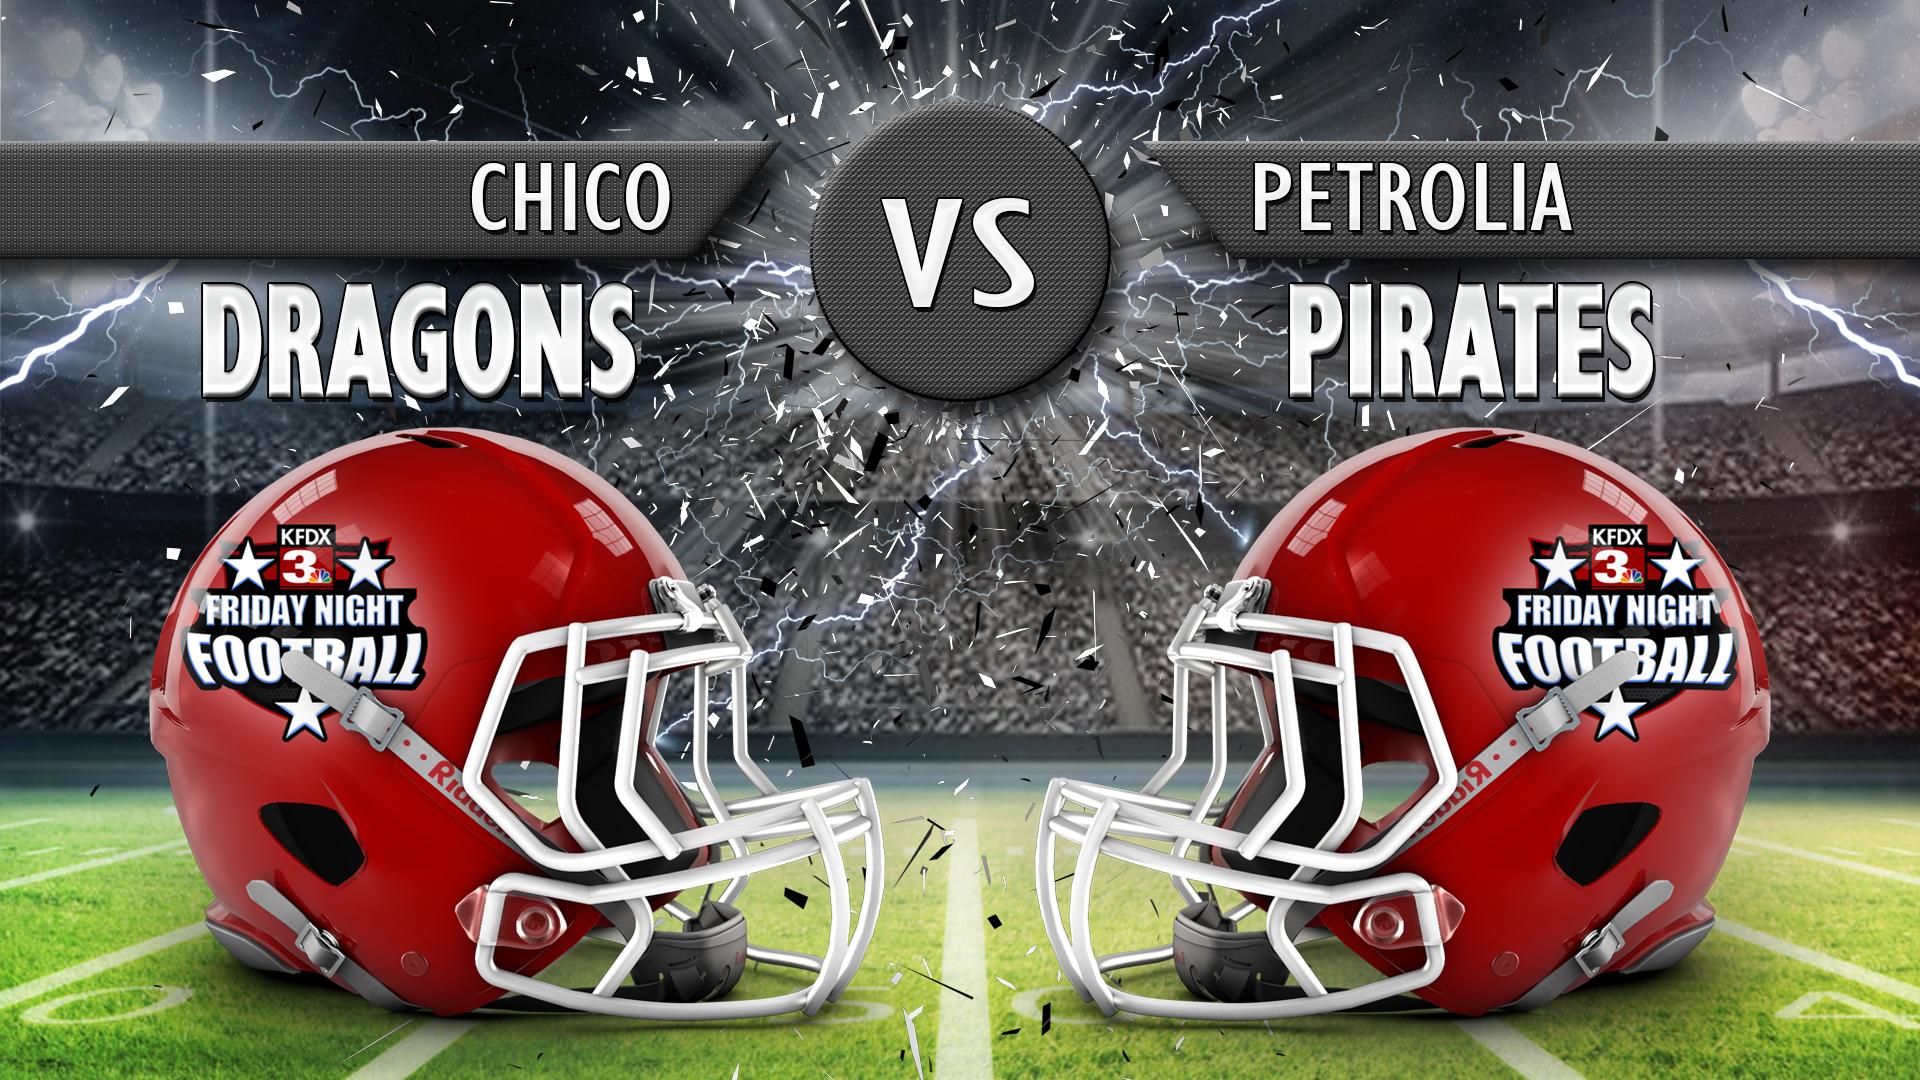 CHICO VS PETROLIA_1535737918092.jpg.jpg